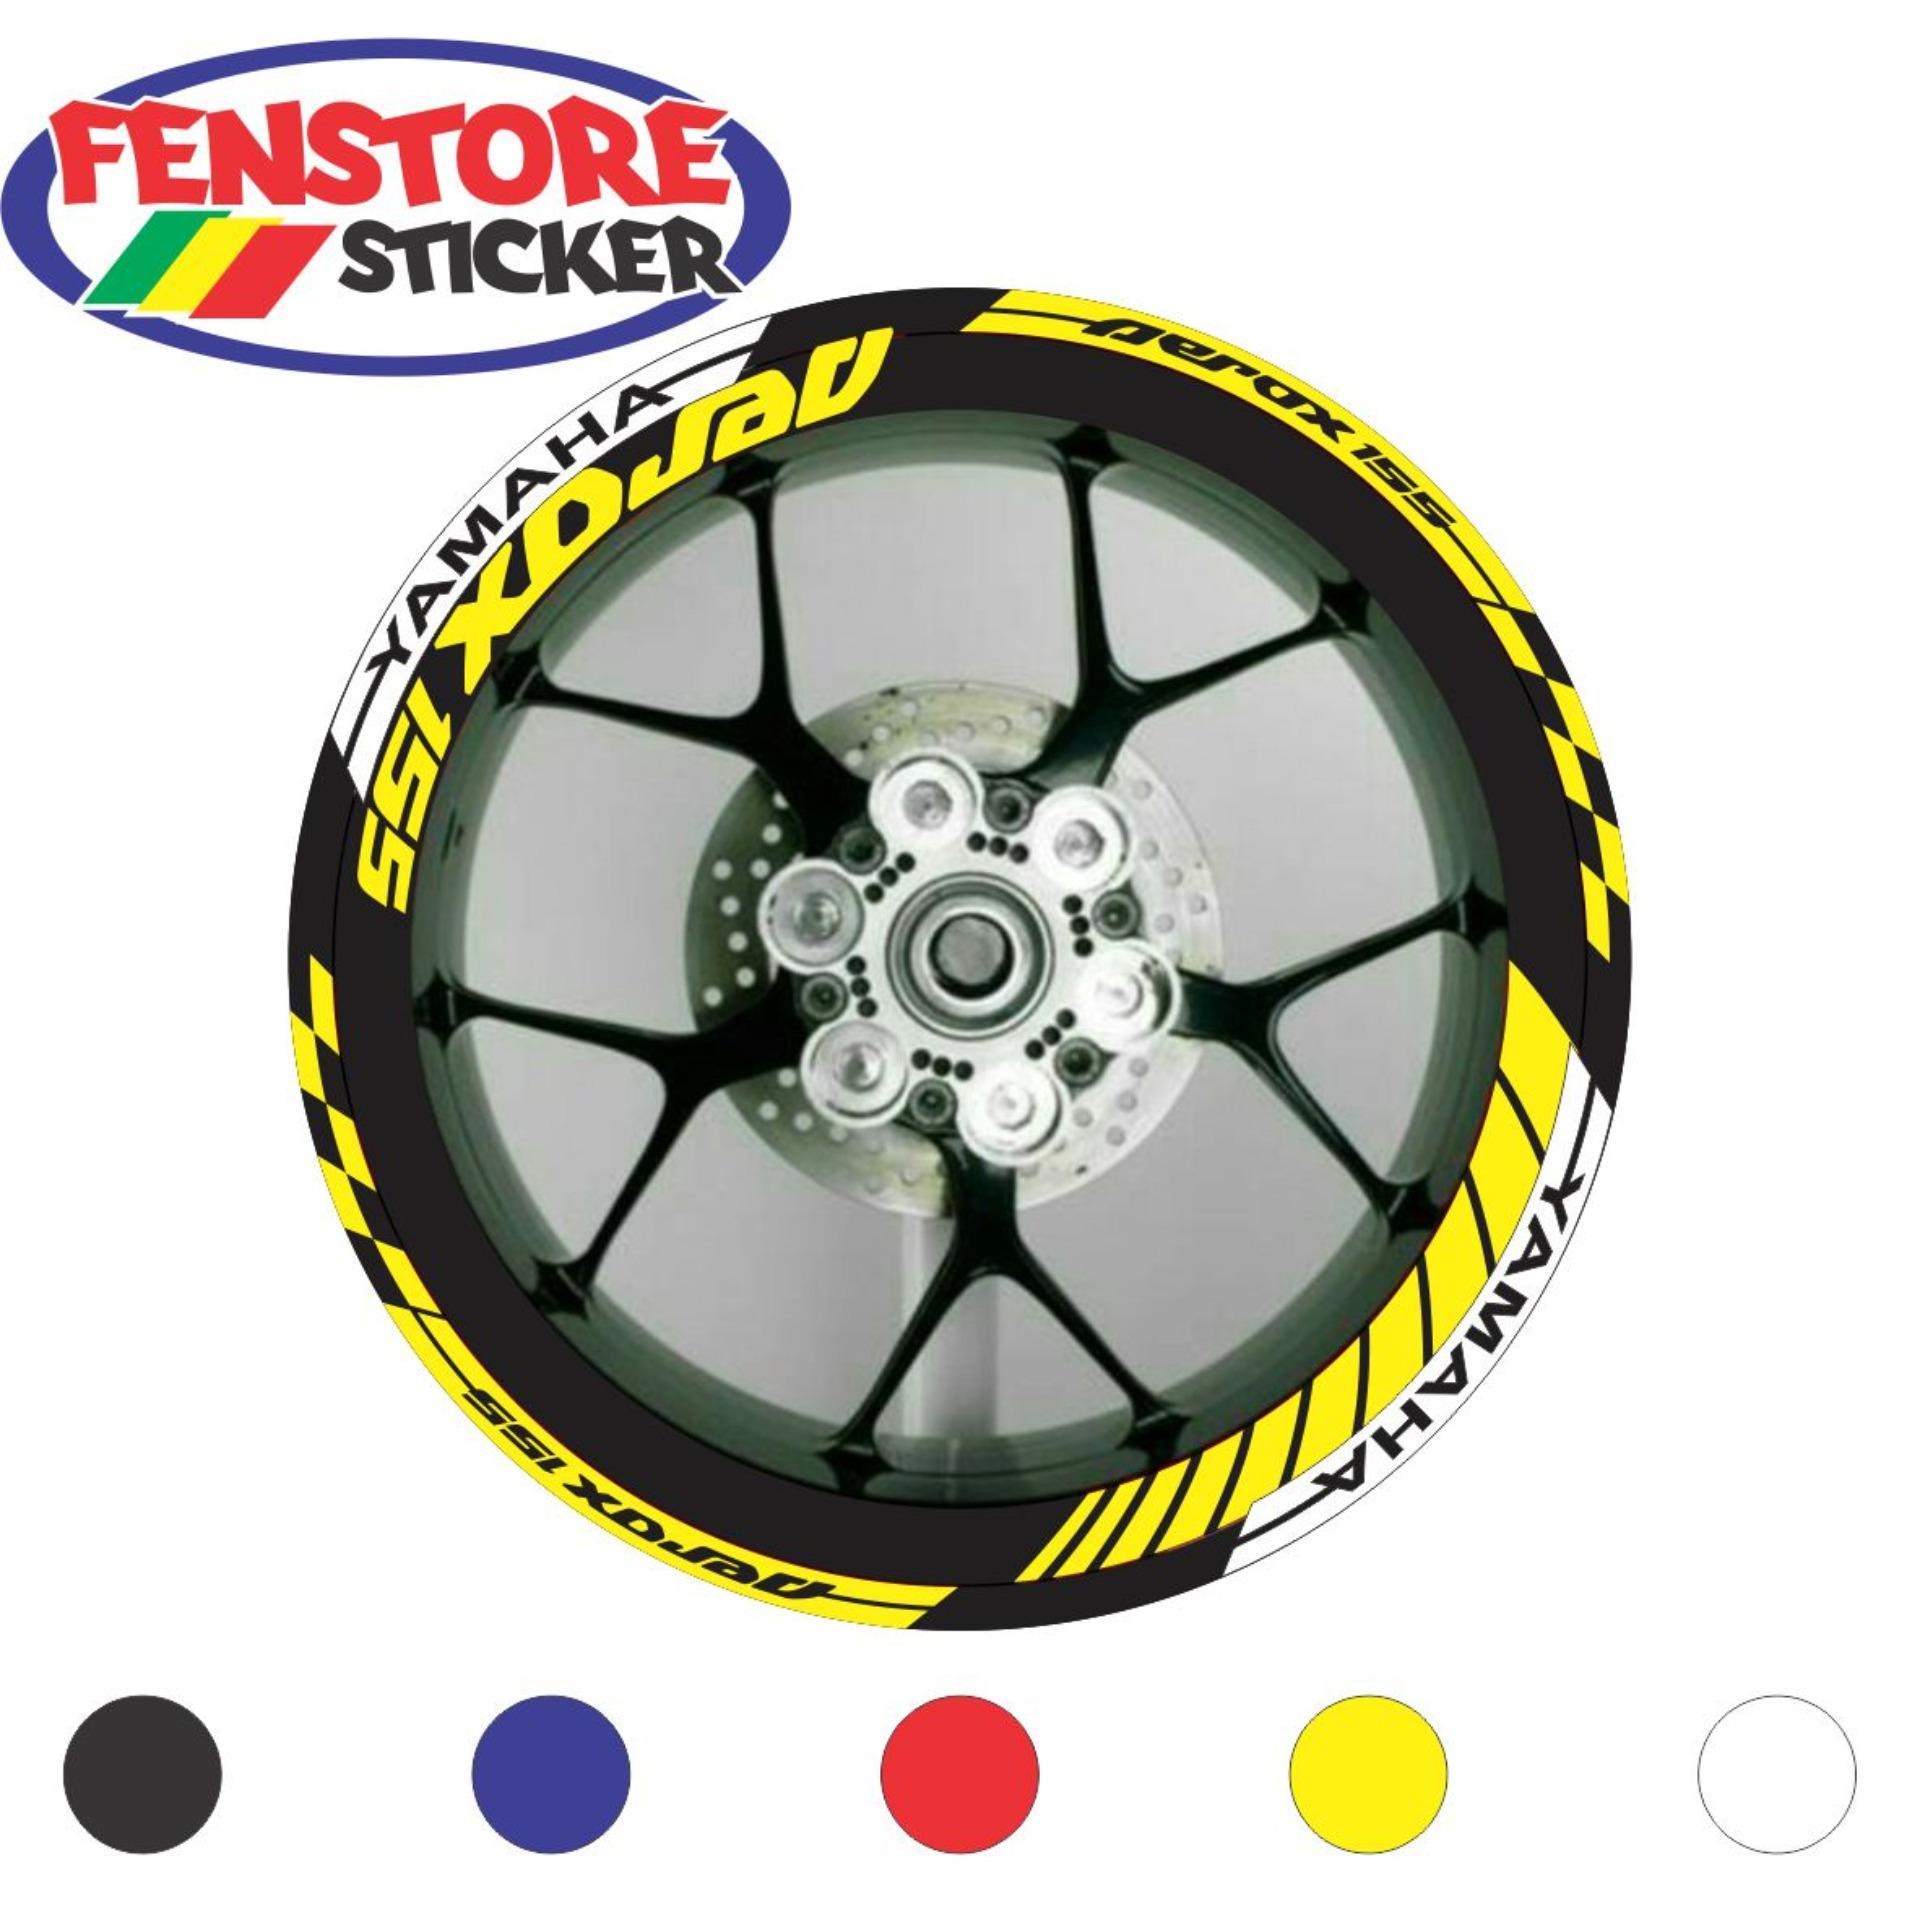 Fenstore cutting sticker aksesoris motor stiker velg yamaha aerox 155 warna kuning f3n